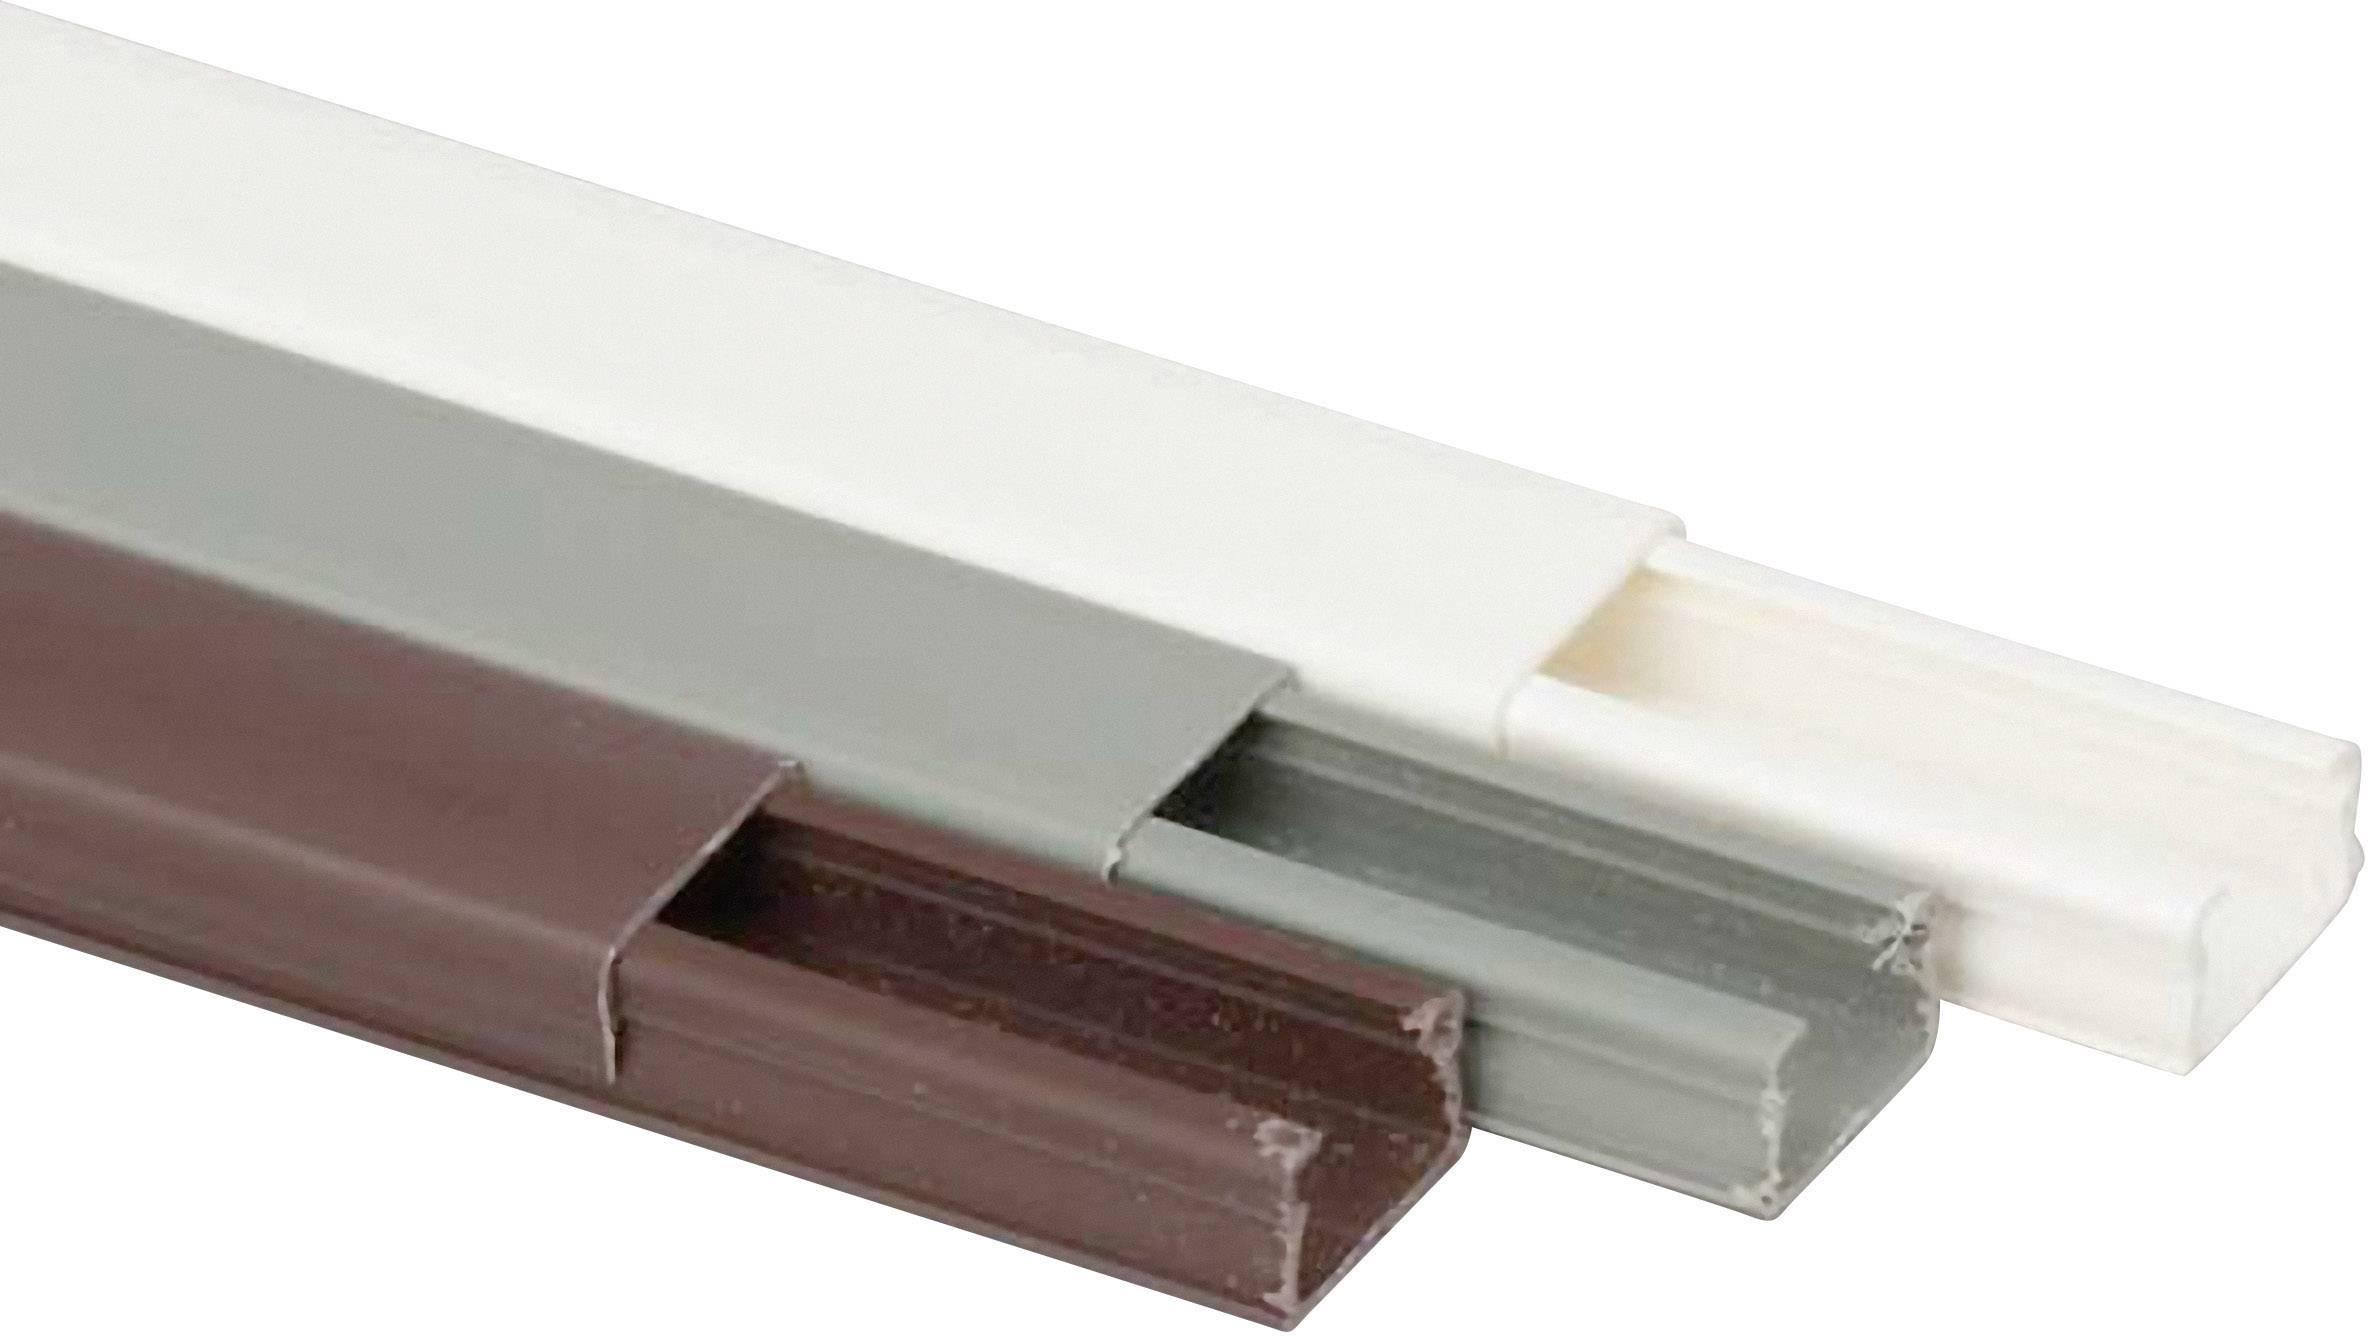 Káblová lišta Heidemann 09936, 1 ks, čisto biela